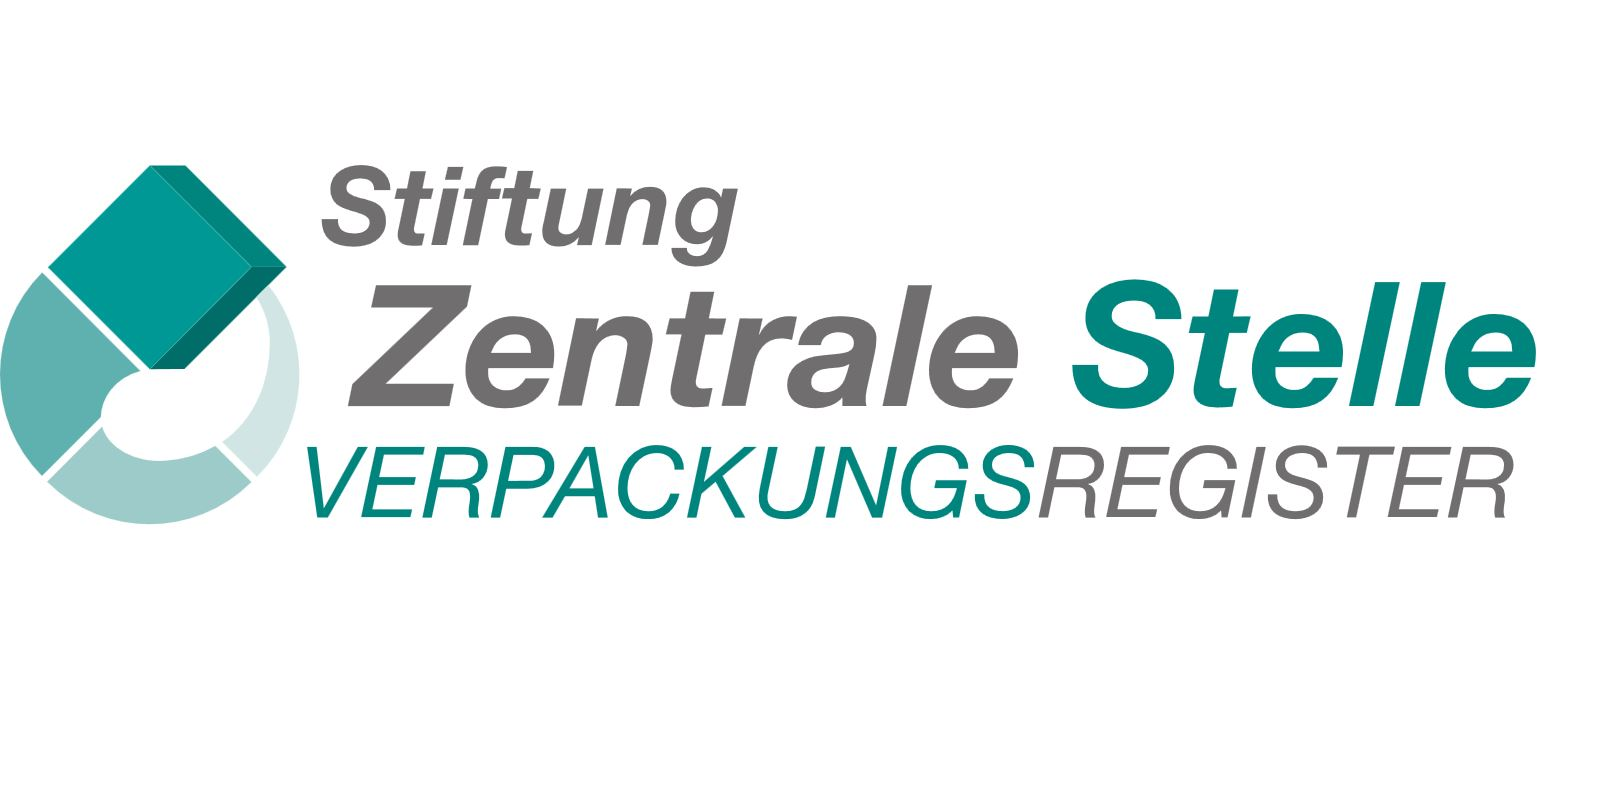 Stiftung zentrale Stelle Verpackungsregister